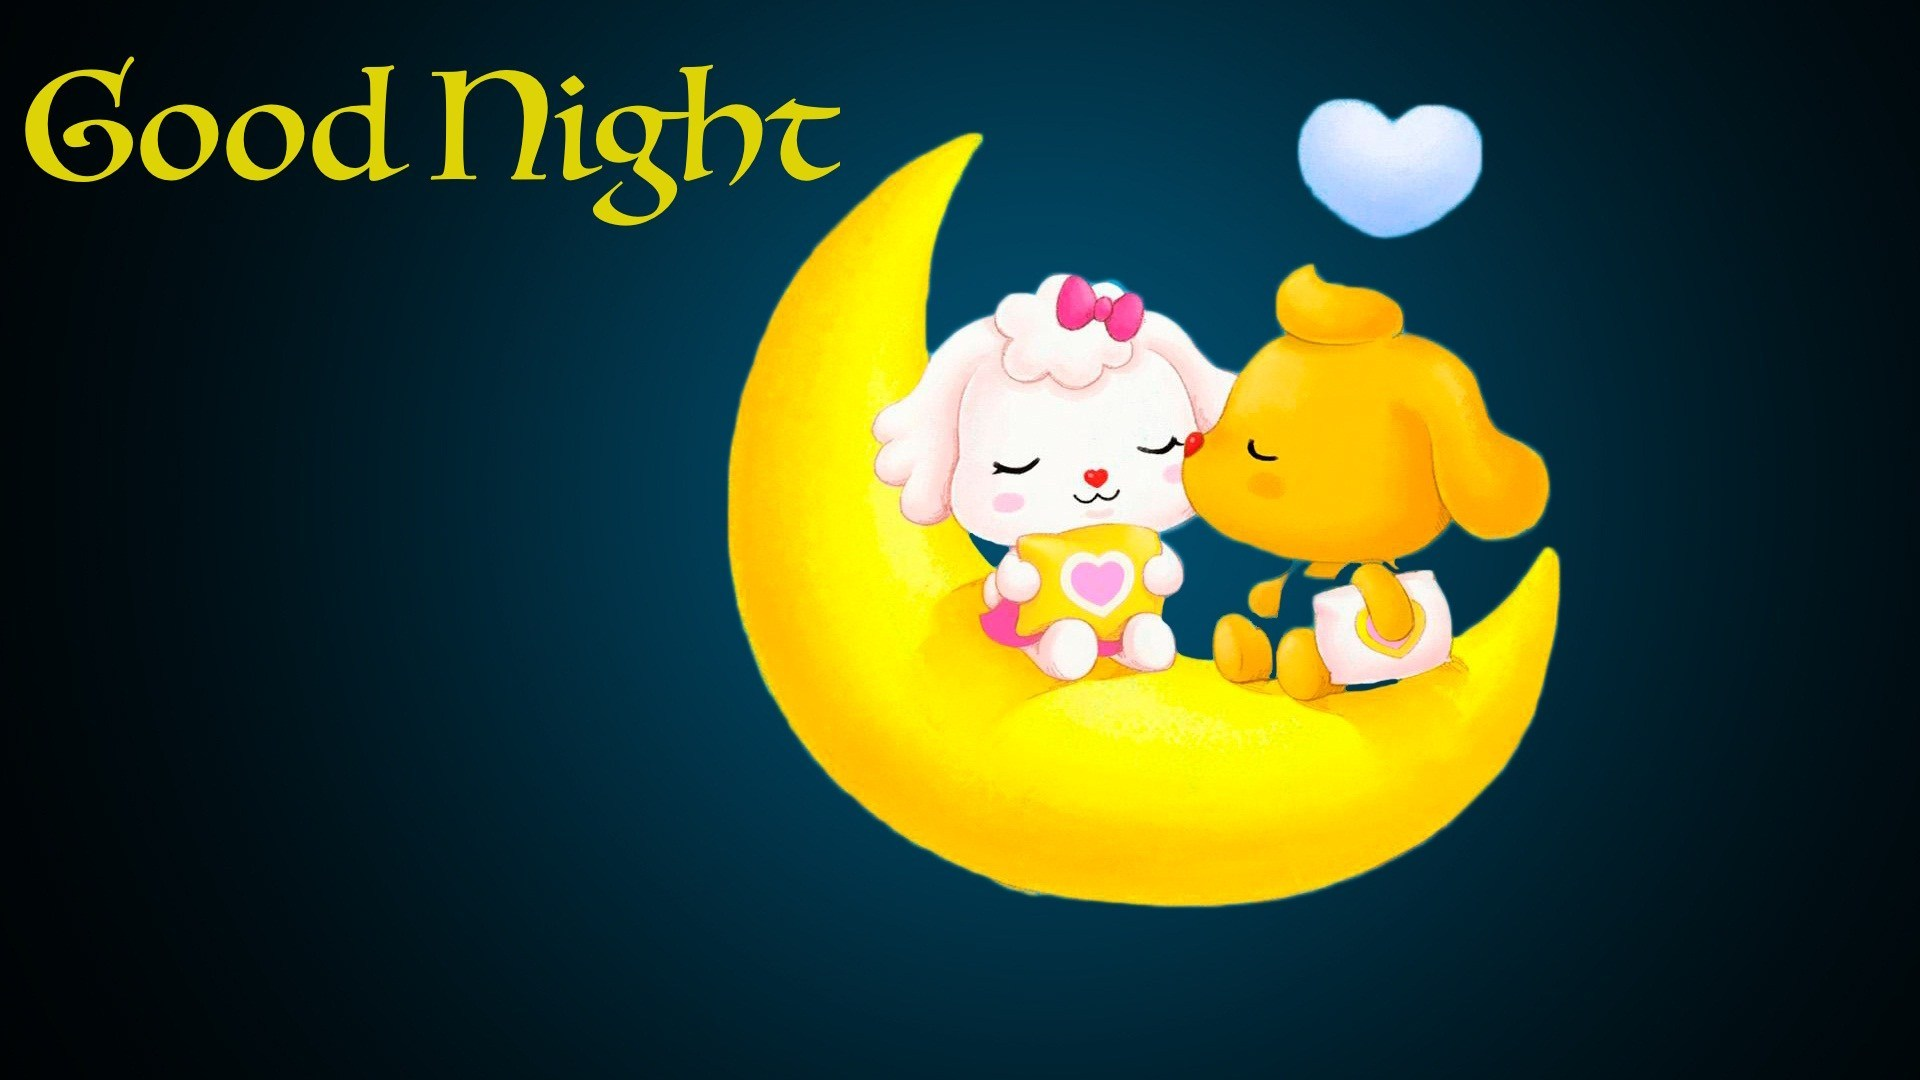 Good Night Cartoon Kiss Moon Image - Love Good Night Cute - HD Wallpaper